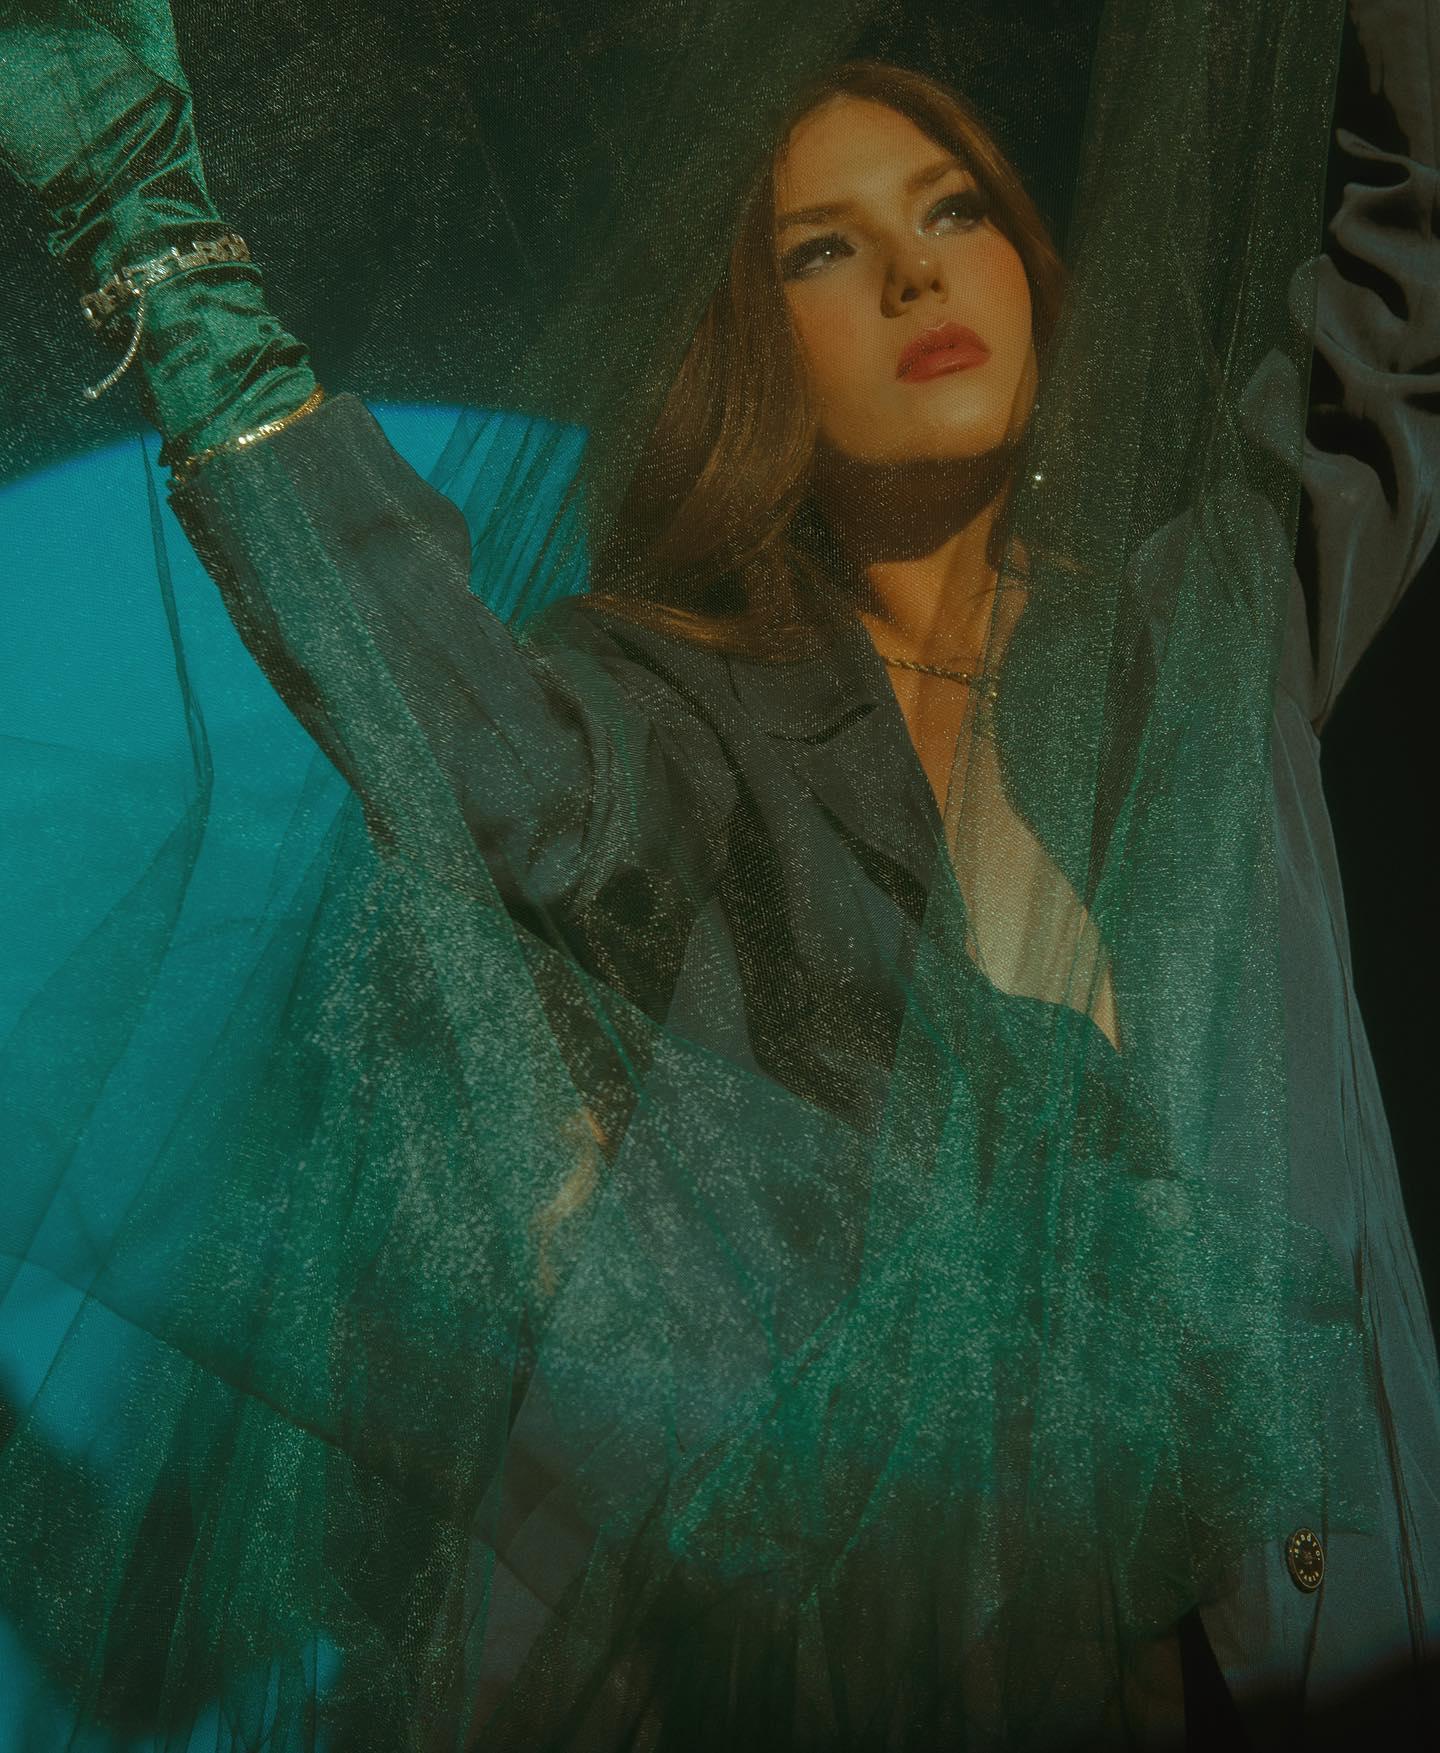 ariane - indie music - indie pop - new music - France - music blog - wolf in a suit - wolfinasuit - wolf in a suit blog - wolf in a suit music blog